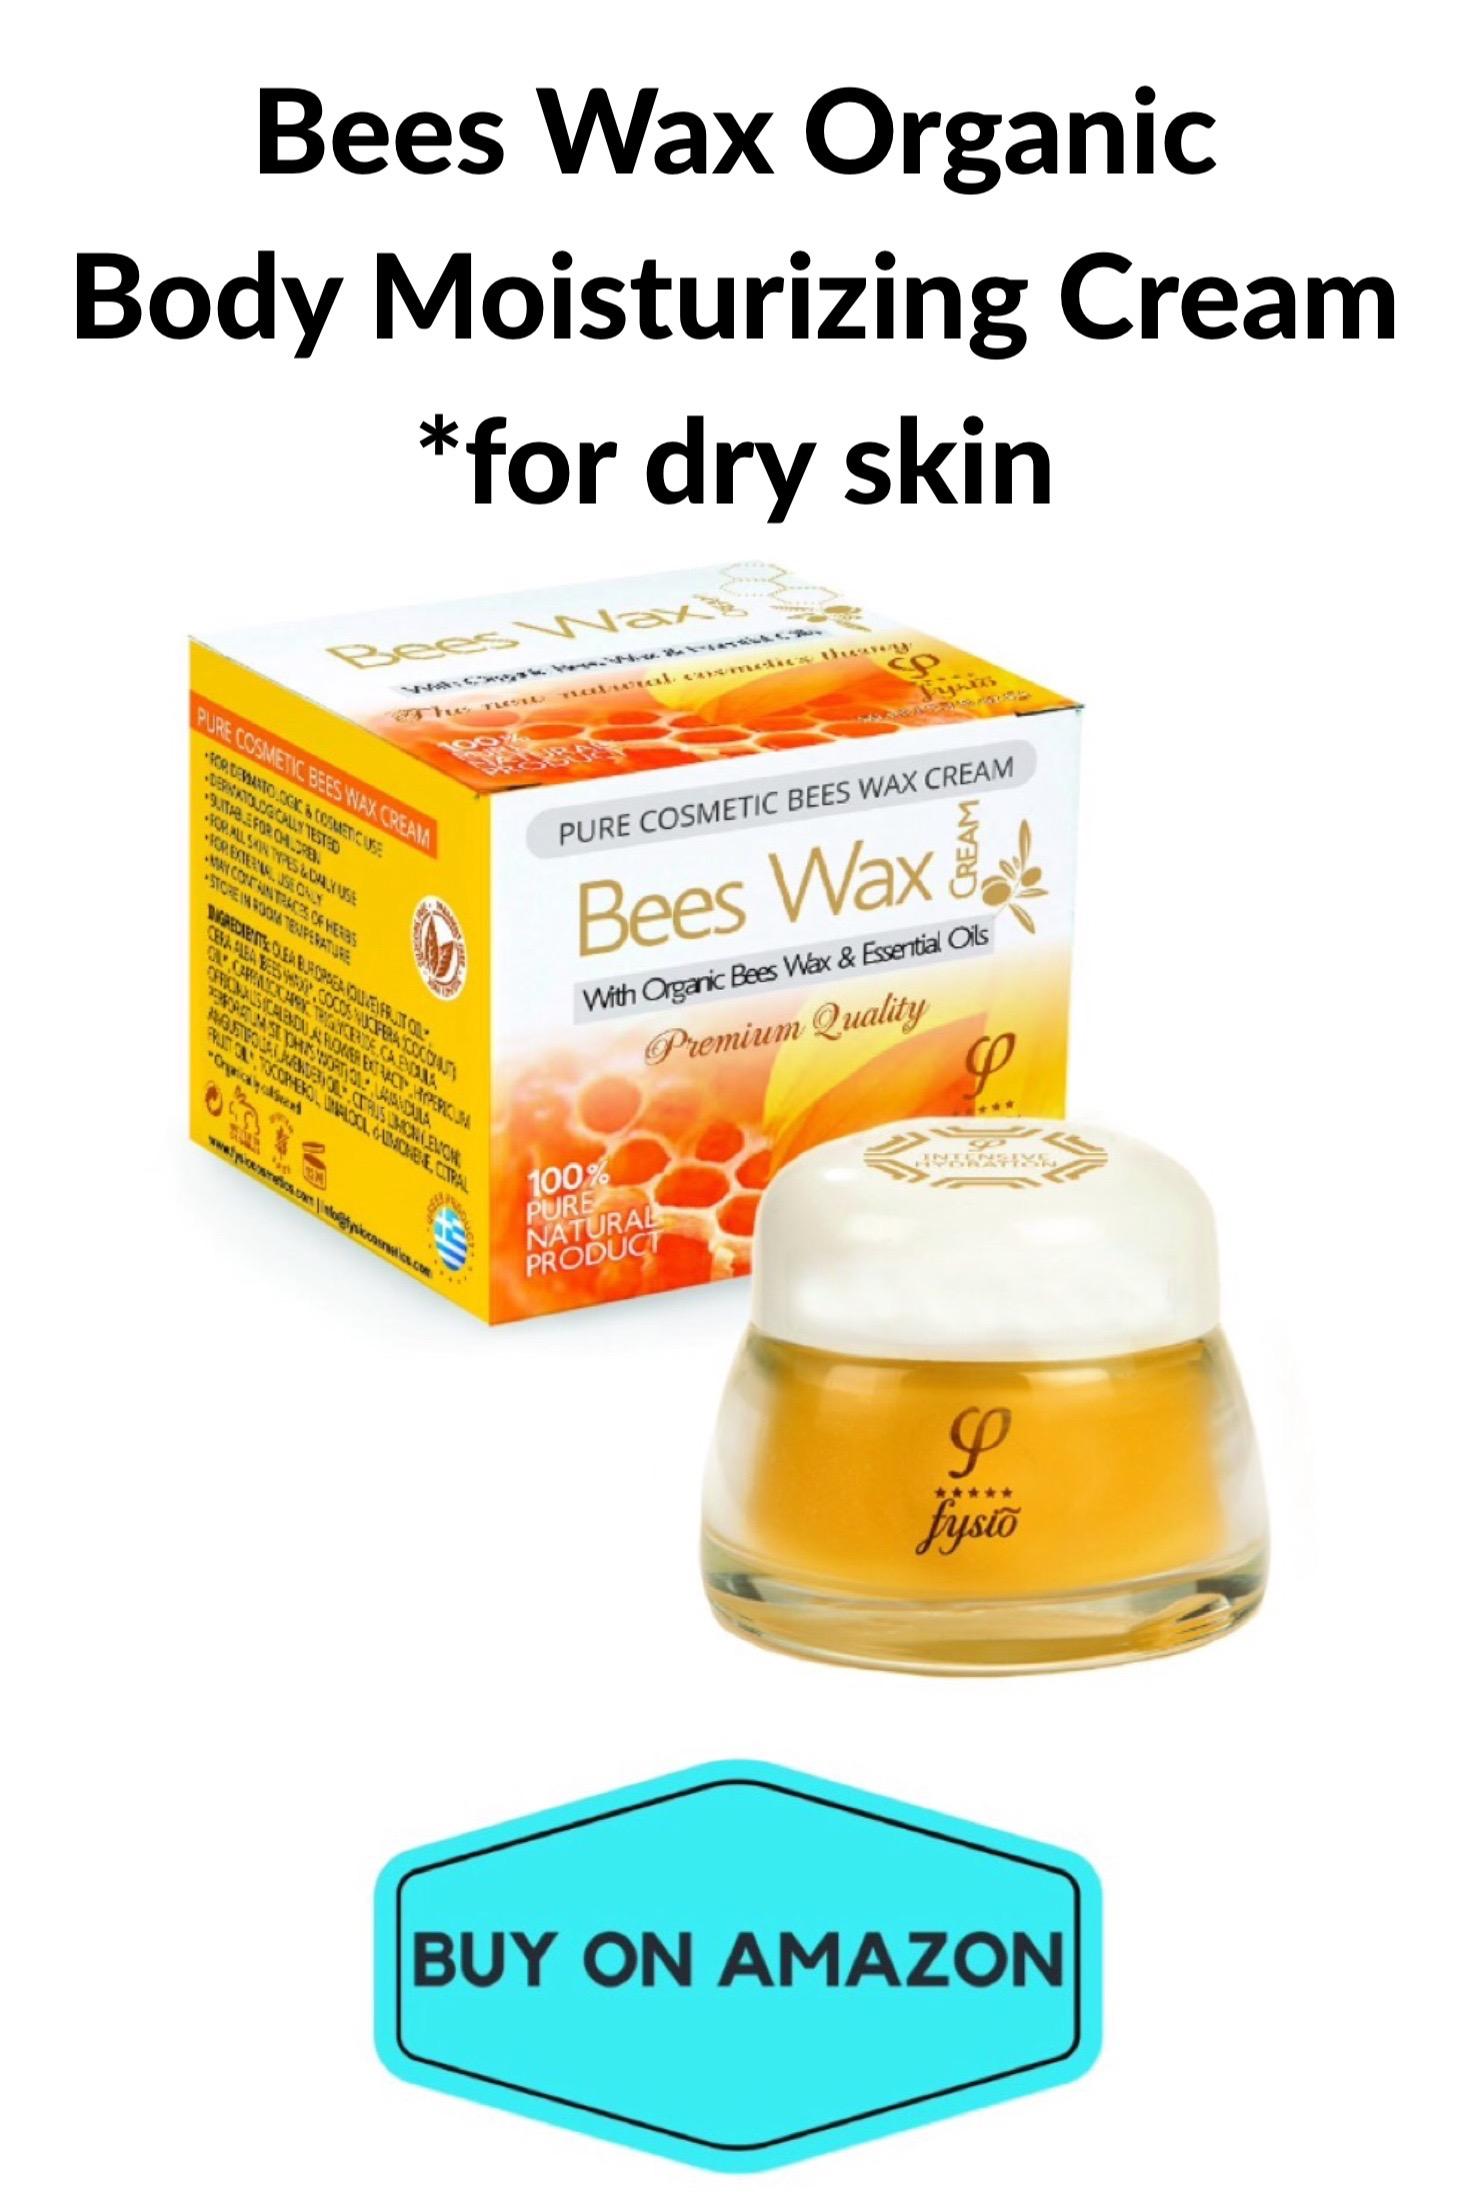 Bees Wax Organic Body Moisturizing Cream